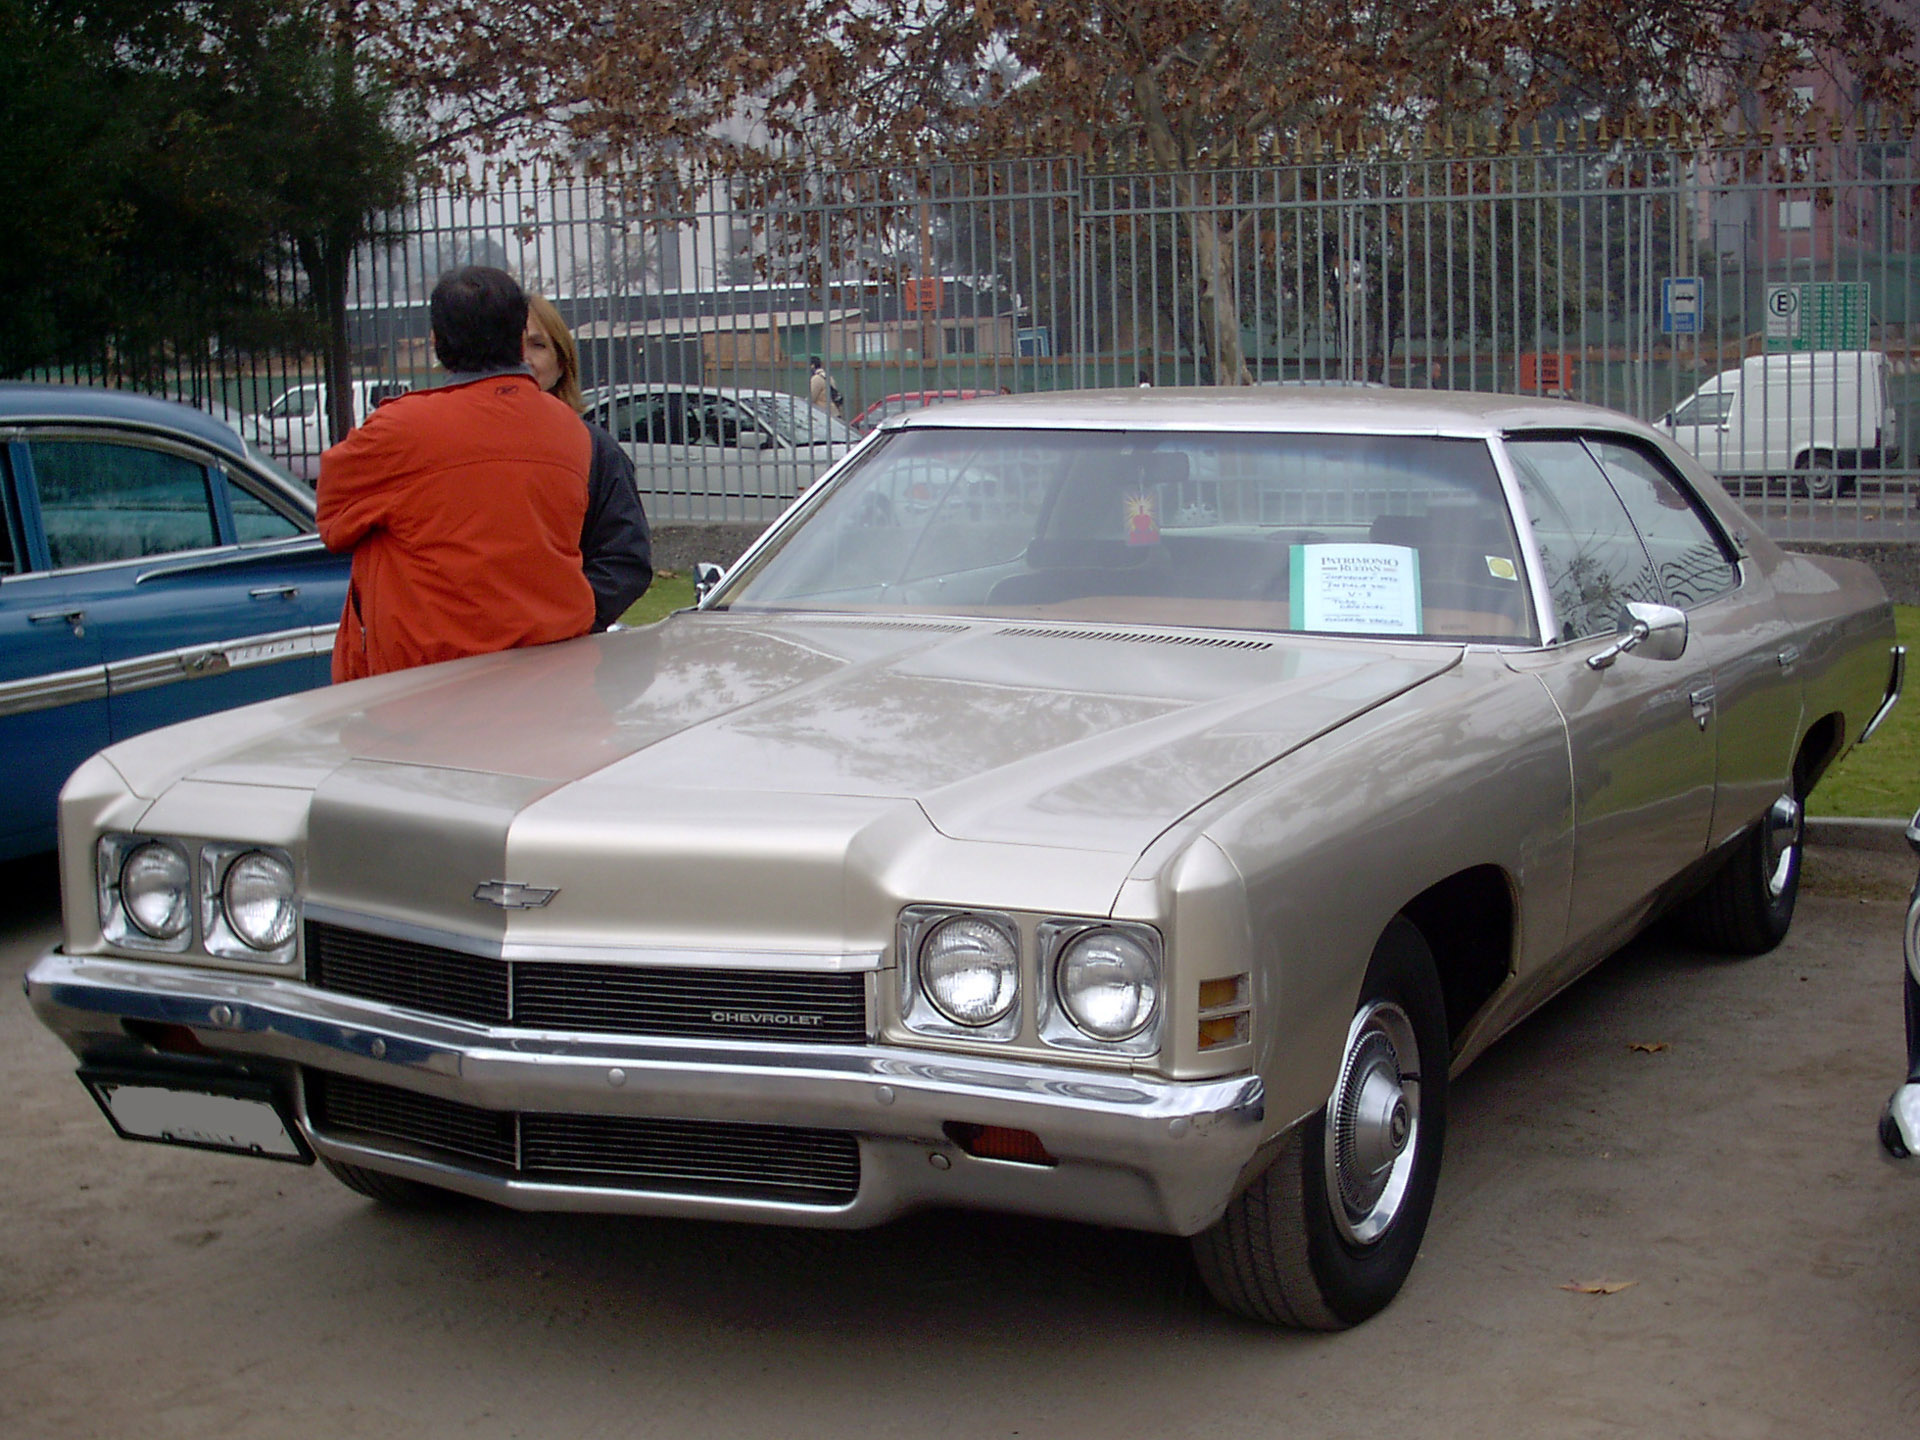 File Chevrolet Impala 1972 14106775621 Jpg Wikimedia